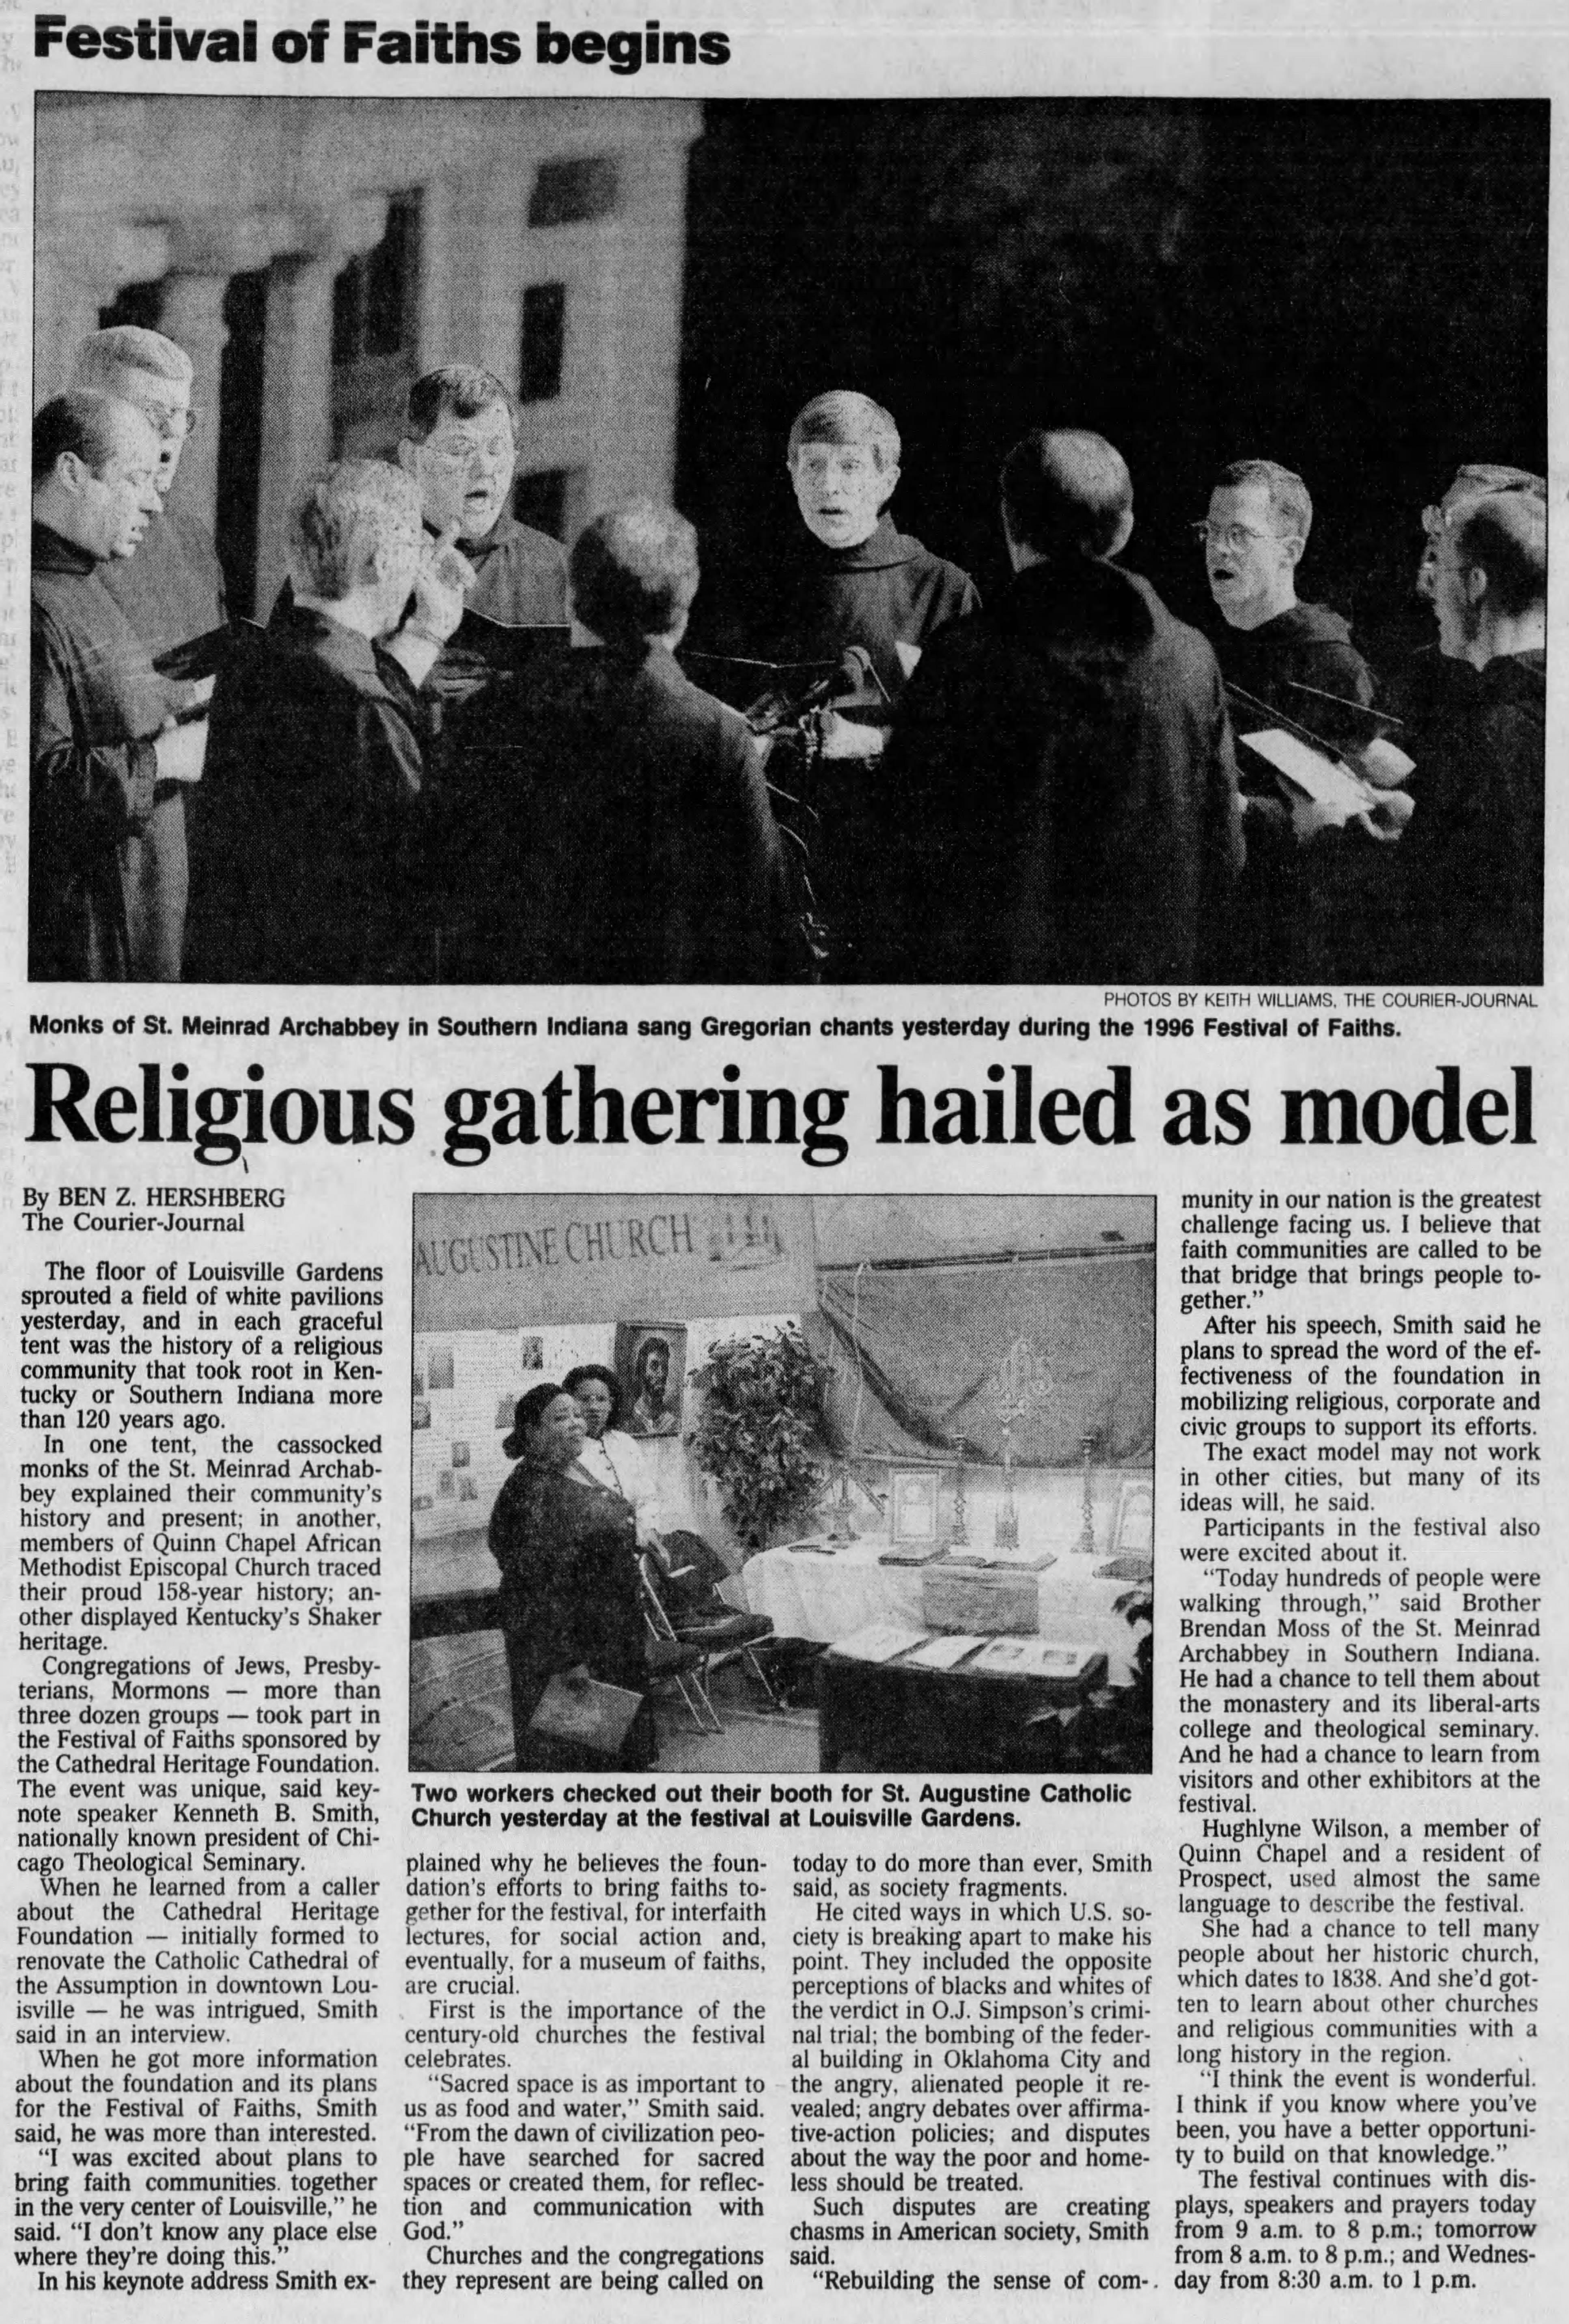 "Hershberg, Ben Z. ""Religious Gathering Hailed as Model."" The Courier-Journal, 18 Nov. 1996, p. 9."